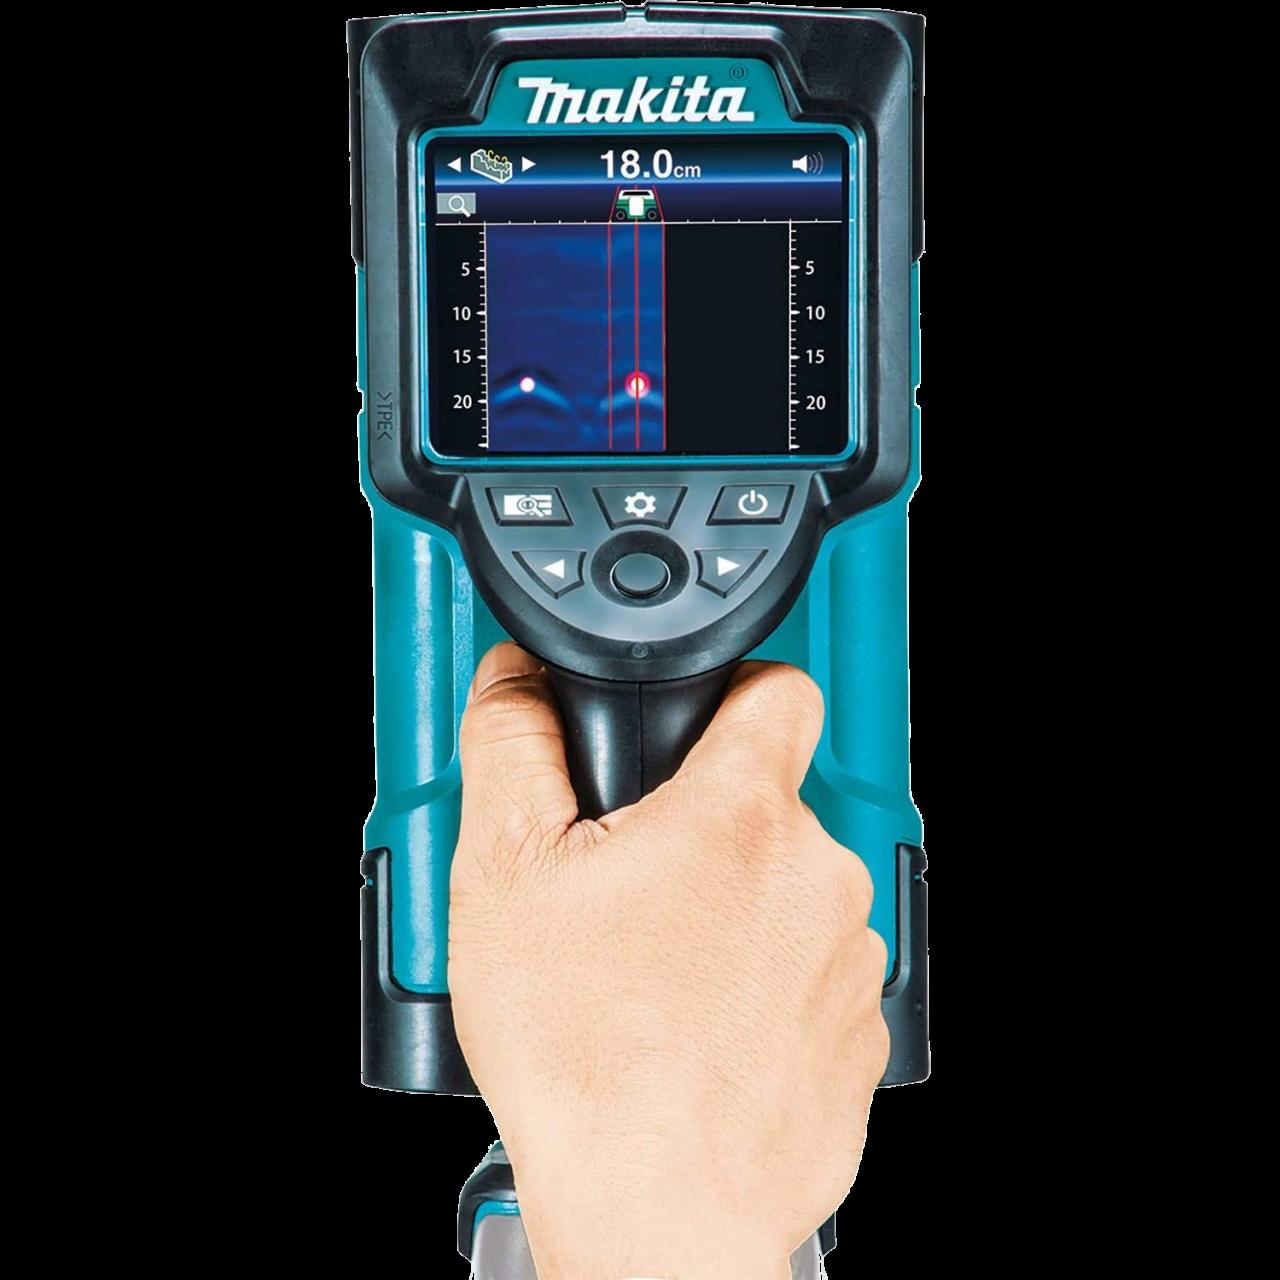 Makita DWD181ZJ Akku-Ortungsgerät LXT im MAKPAC Gr. 2 inkl. Einlage, 18V, +/- 5 mm, 180 mm